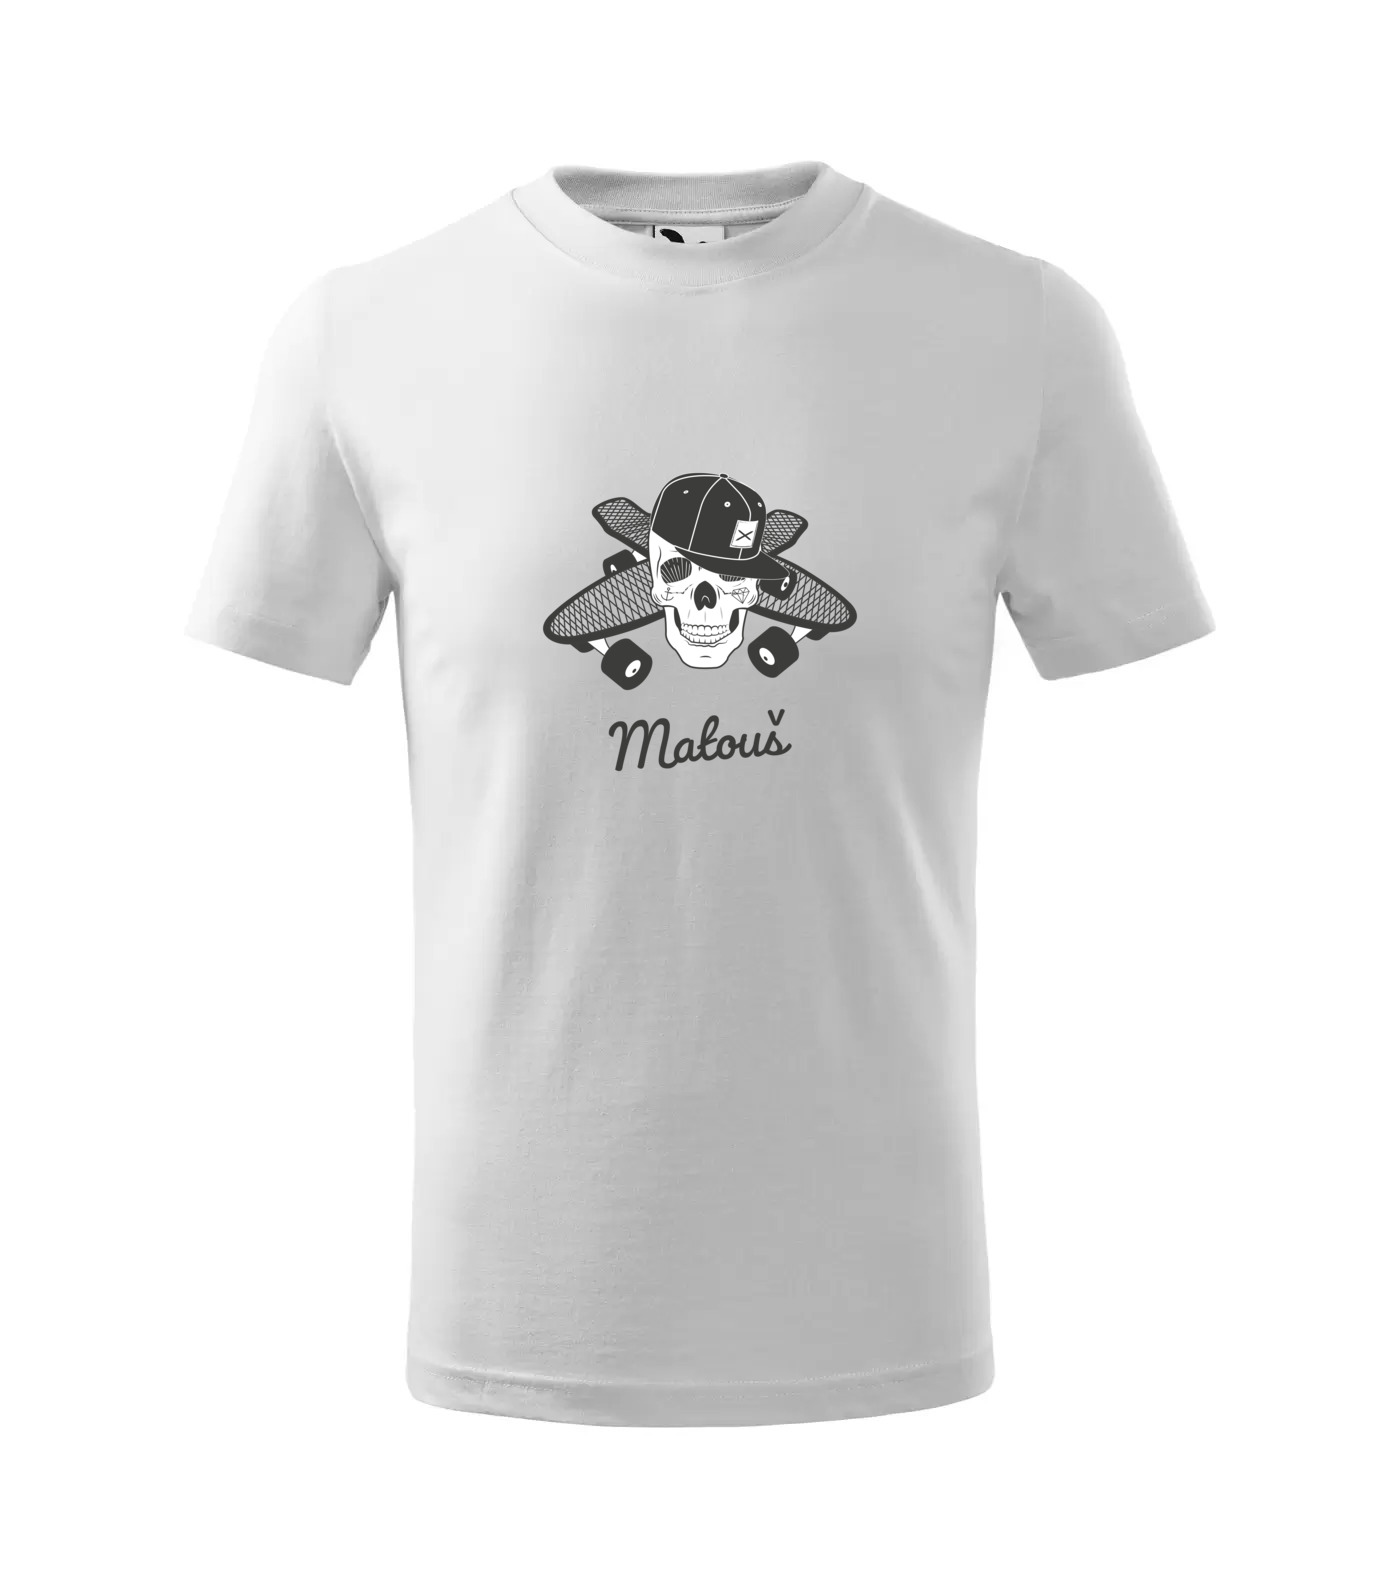 Tričko Skejťák Matouš